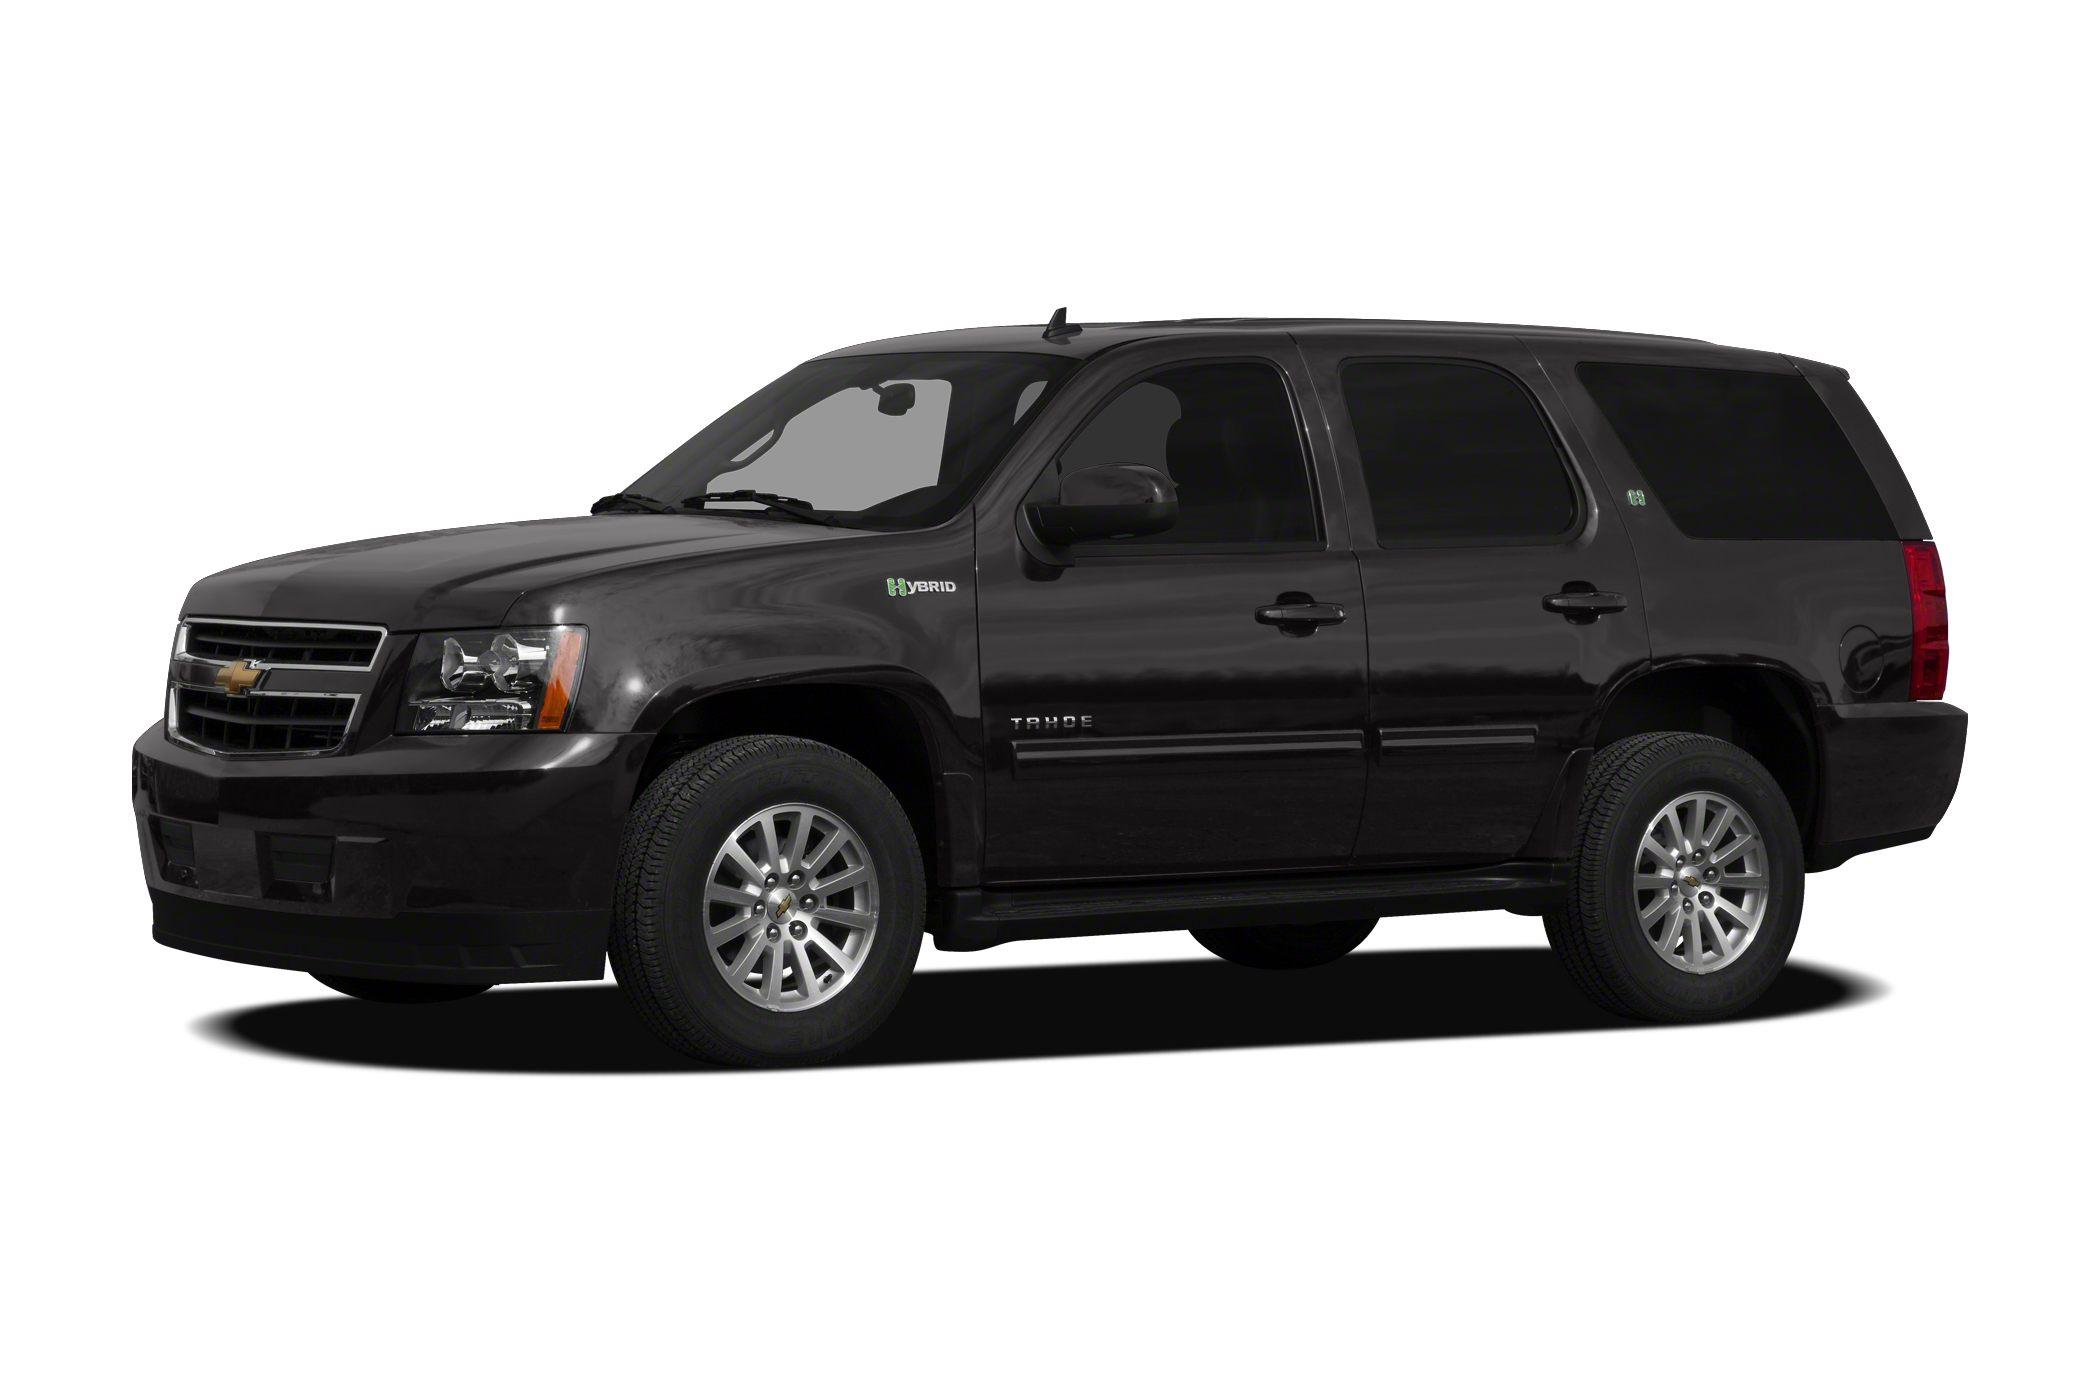 2010 Chevrolet Tahoe Hybrid